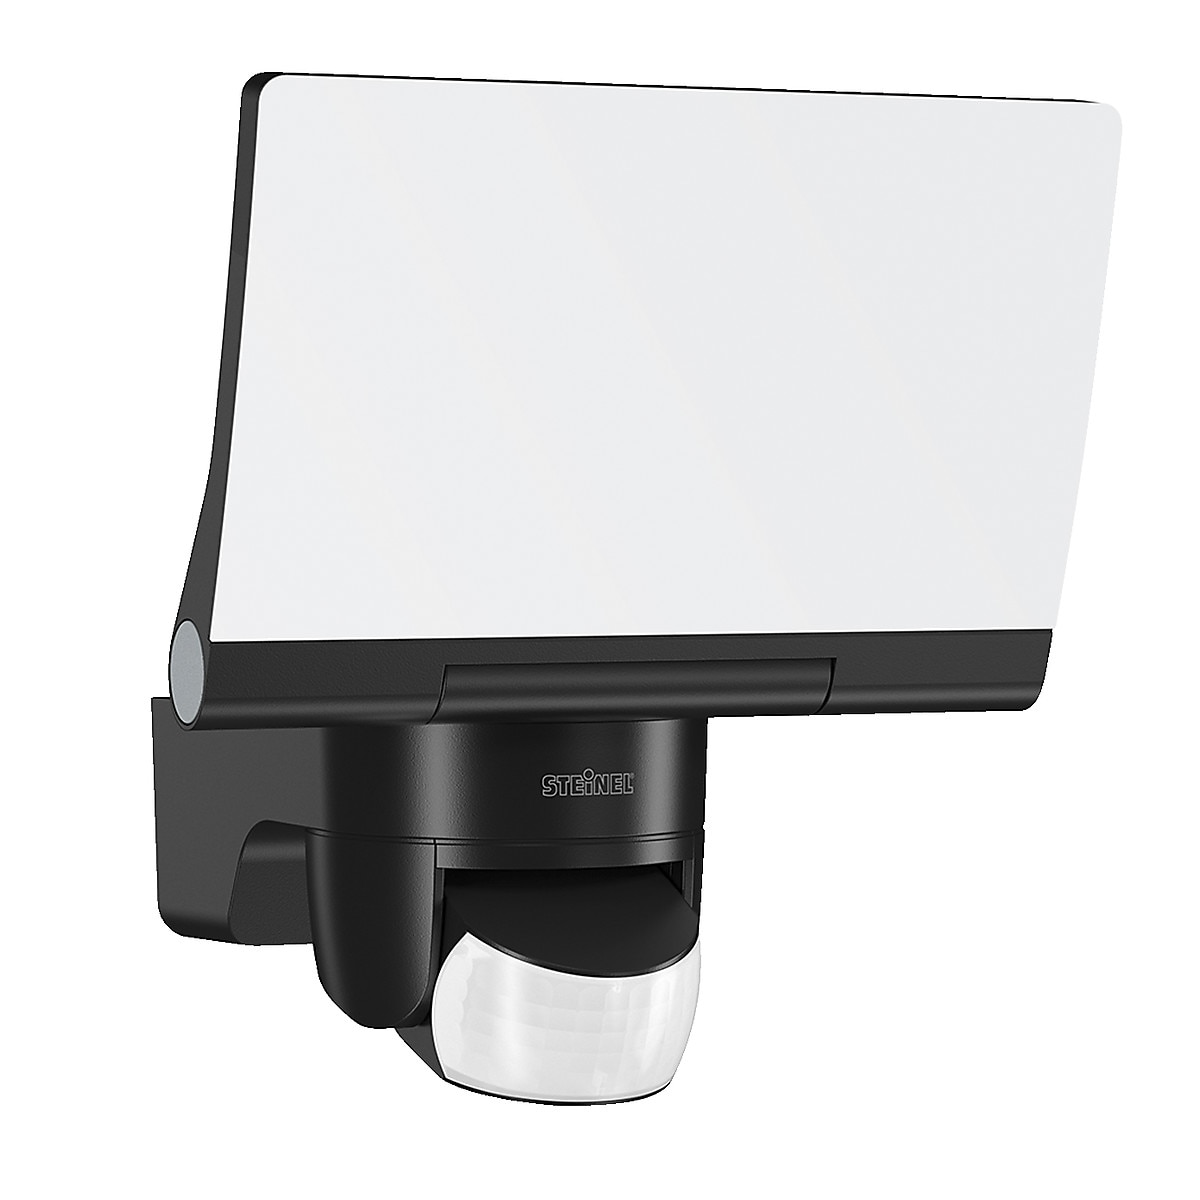 Strålkastare XLED Home 2 Sensor 14,8 W Steinel